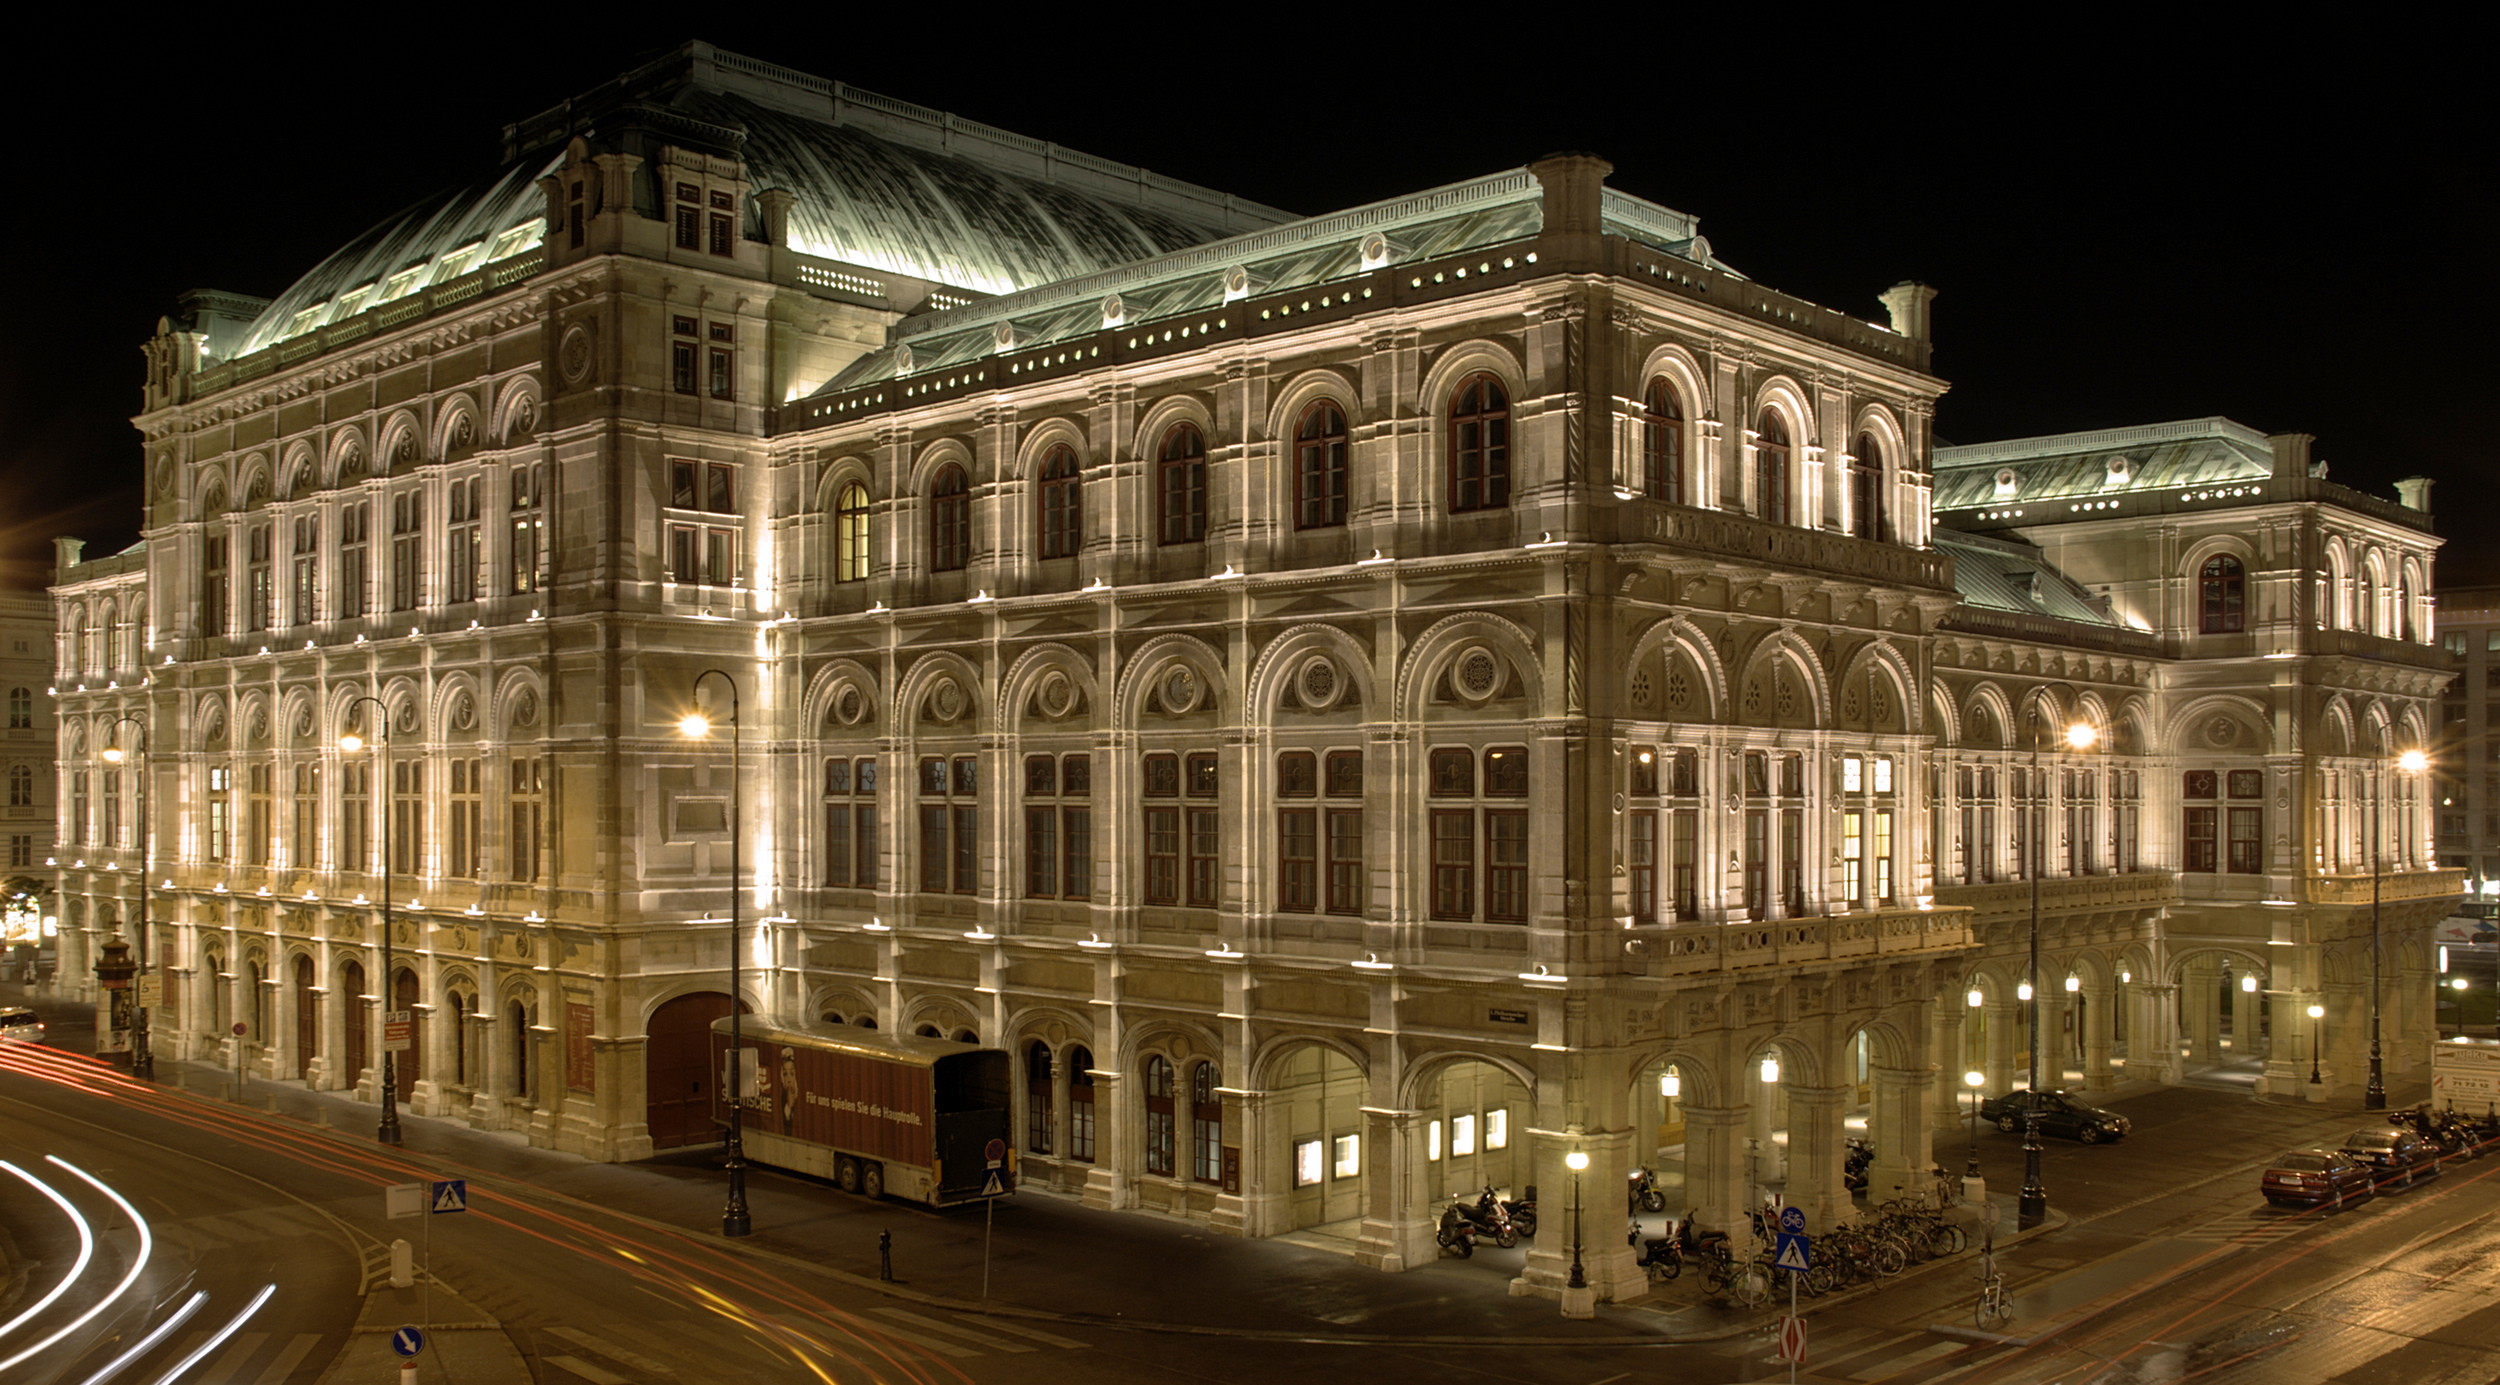 Night view of the Vienna State Opera